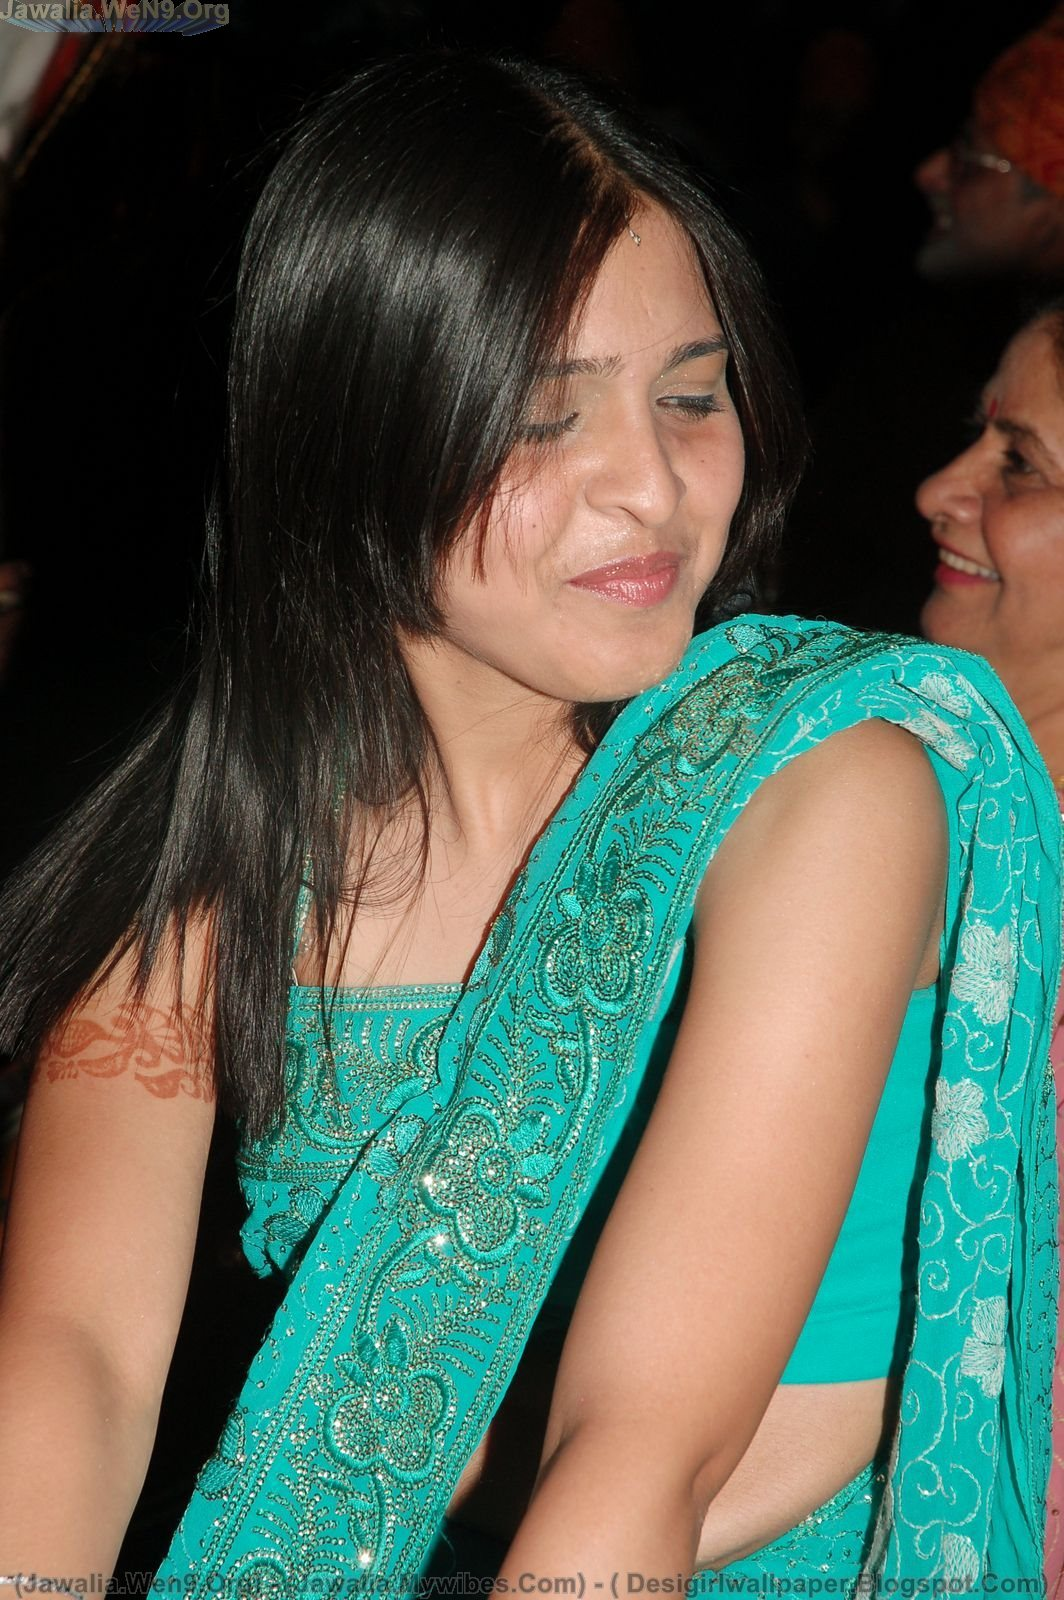 Indias No-1 Desi Girls Wallpapers Collection: Local Desi